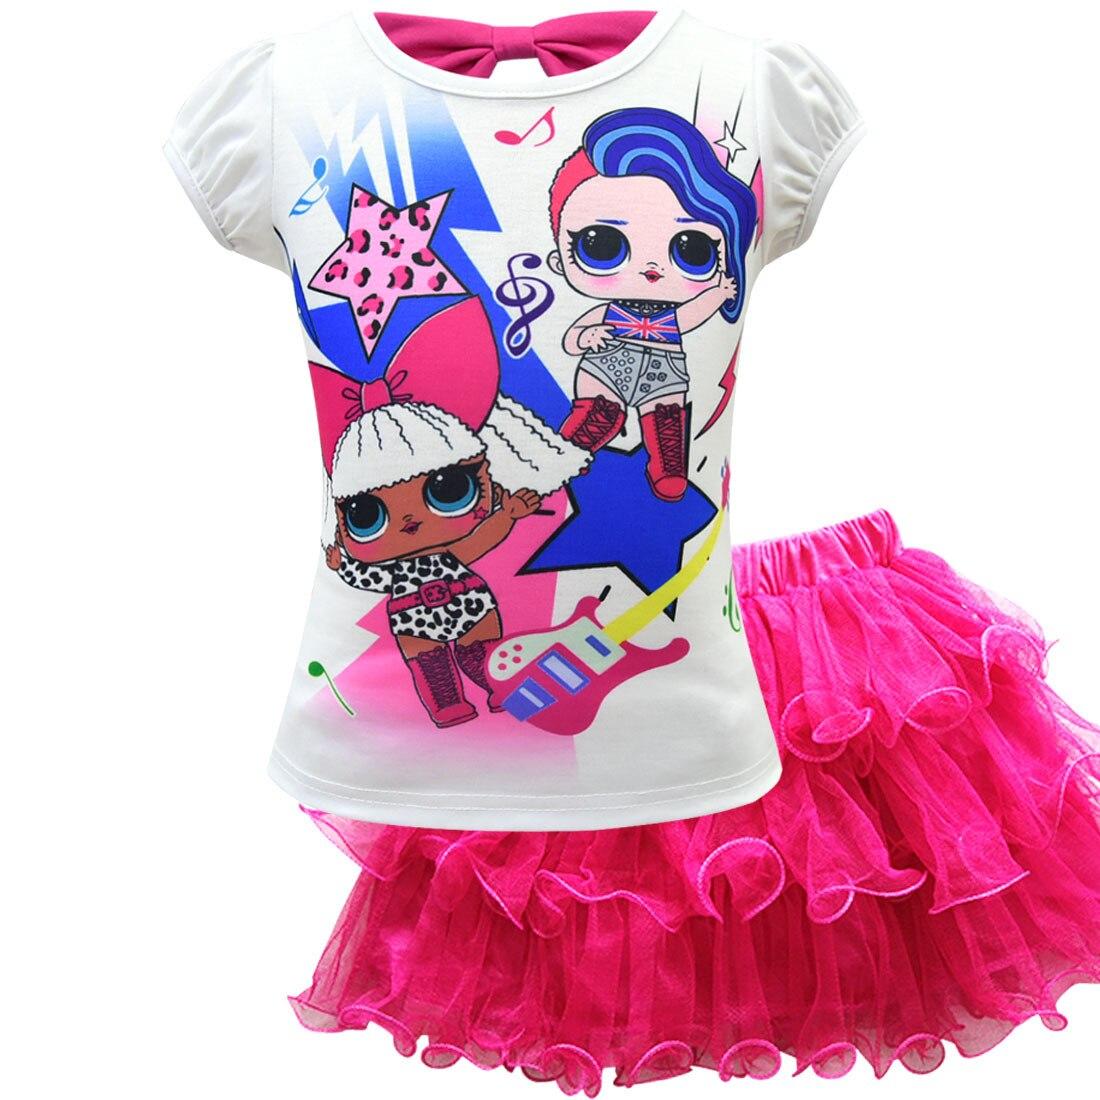 Toddler Girl Clothes 2019 Summer Lol Dress Kids Short Sleeve T-shirt+ Dress For Clothing Set Cartoon Children Vestidos For Girls